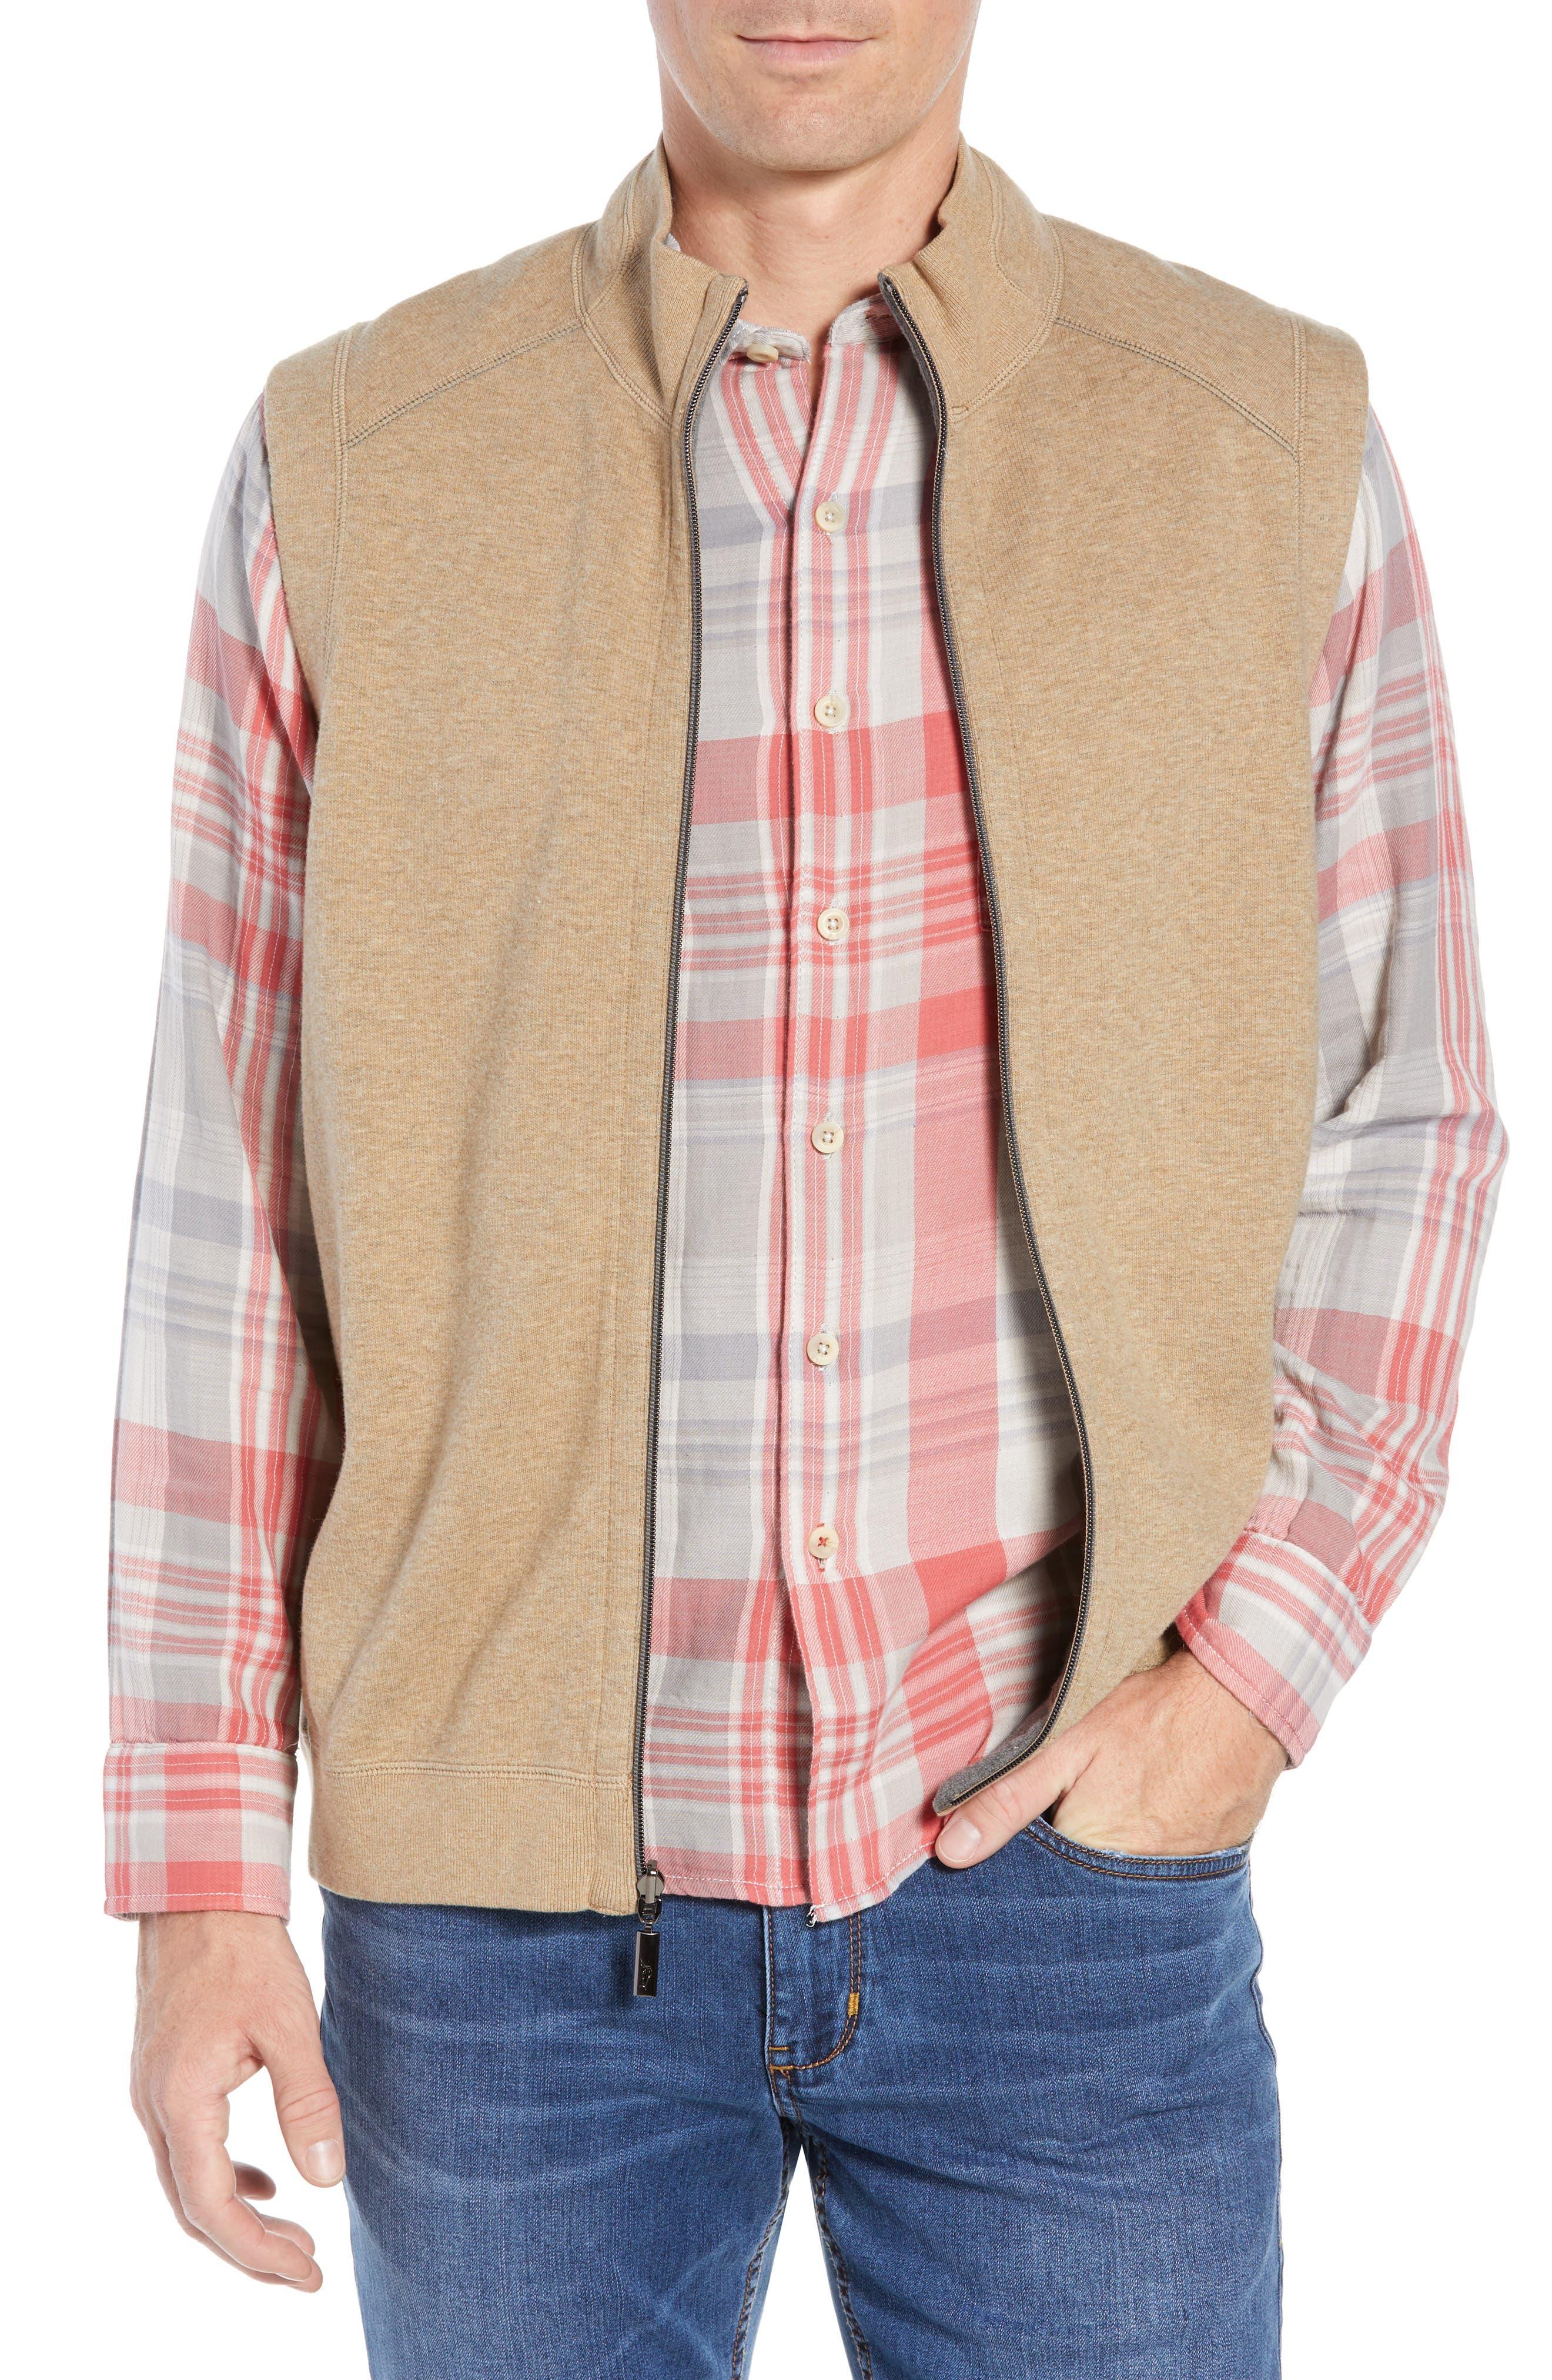 Flip Side Reversible Zip Vest,                             Main thumbnail 1, color,                             GOLDEN HONEY HEATHER